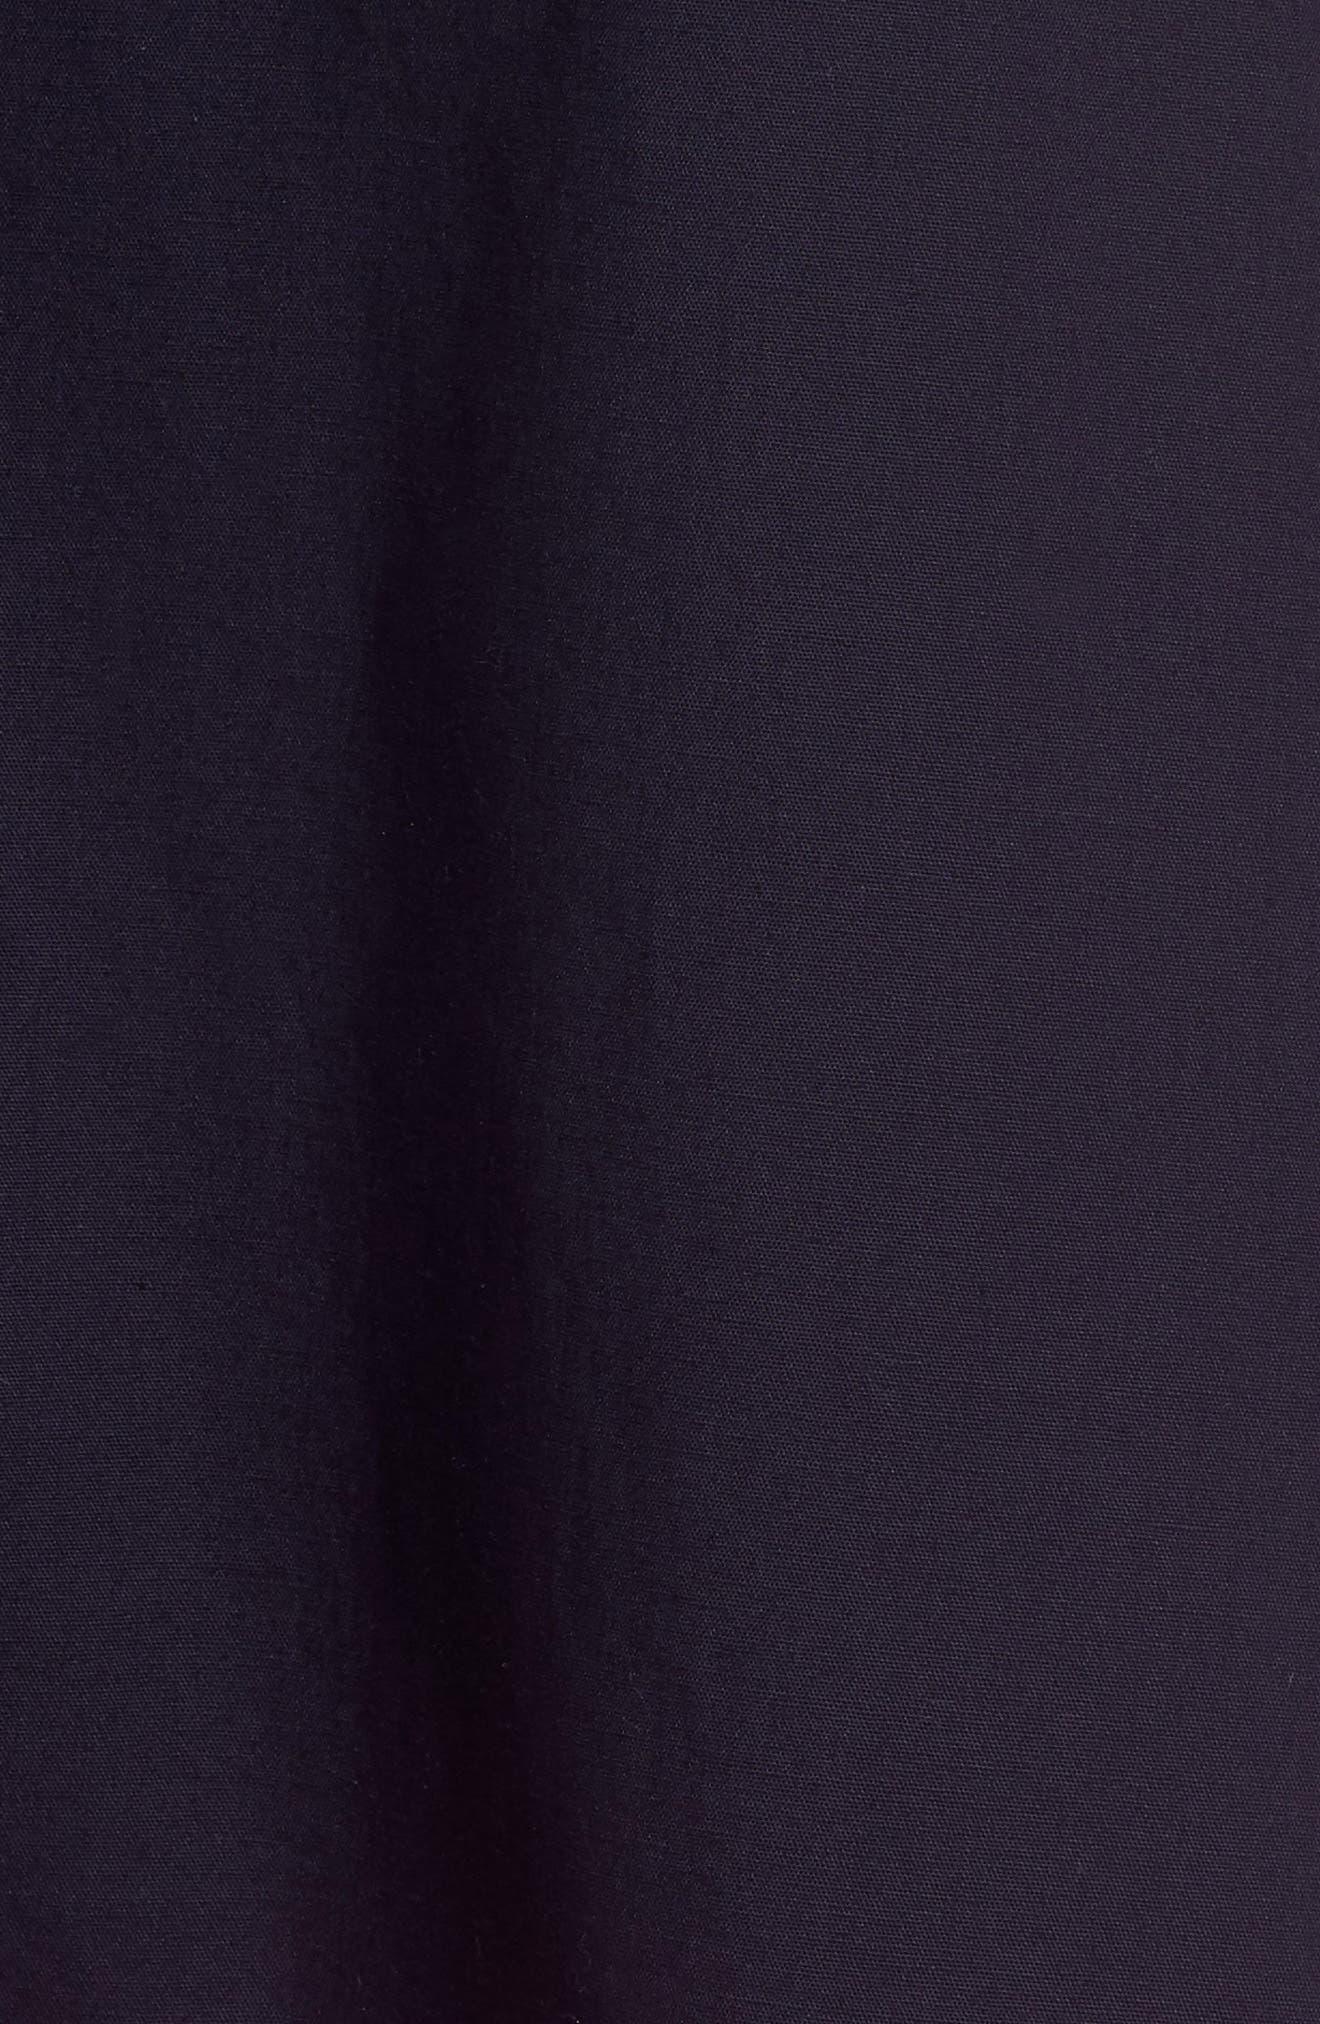 Colorblock Cotton Midi Dress,                             Alternate thumbnail 6, color,                             410